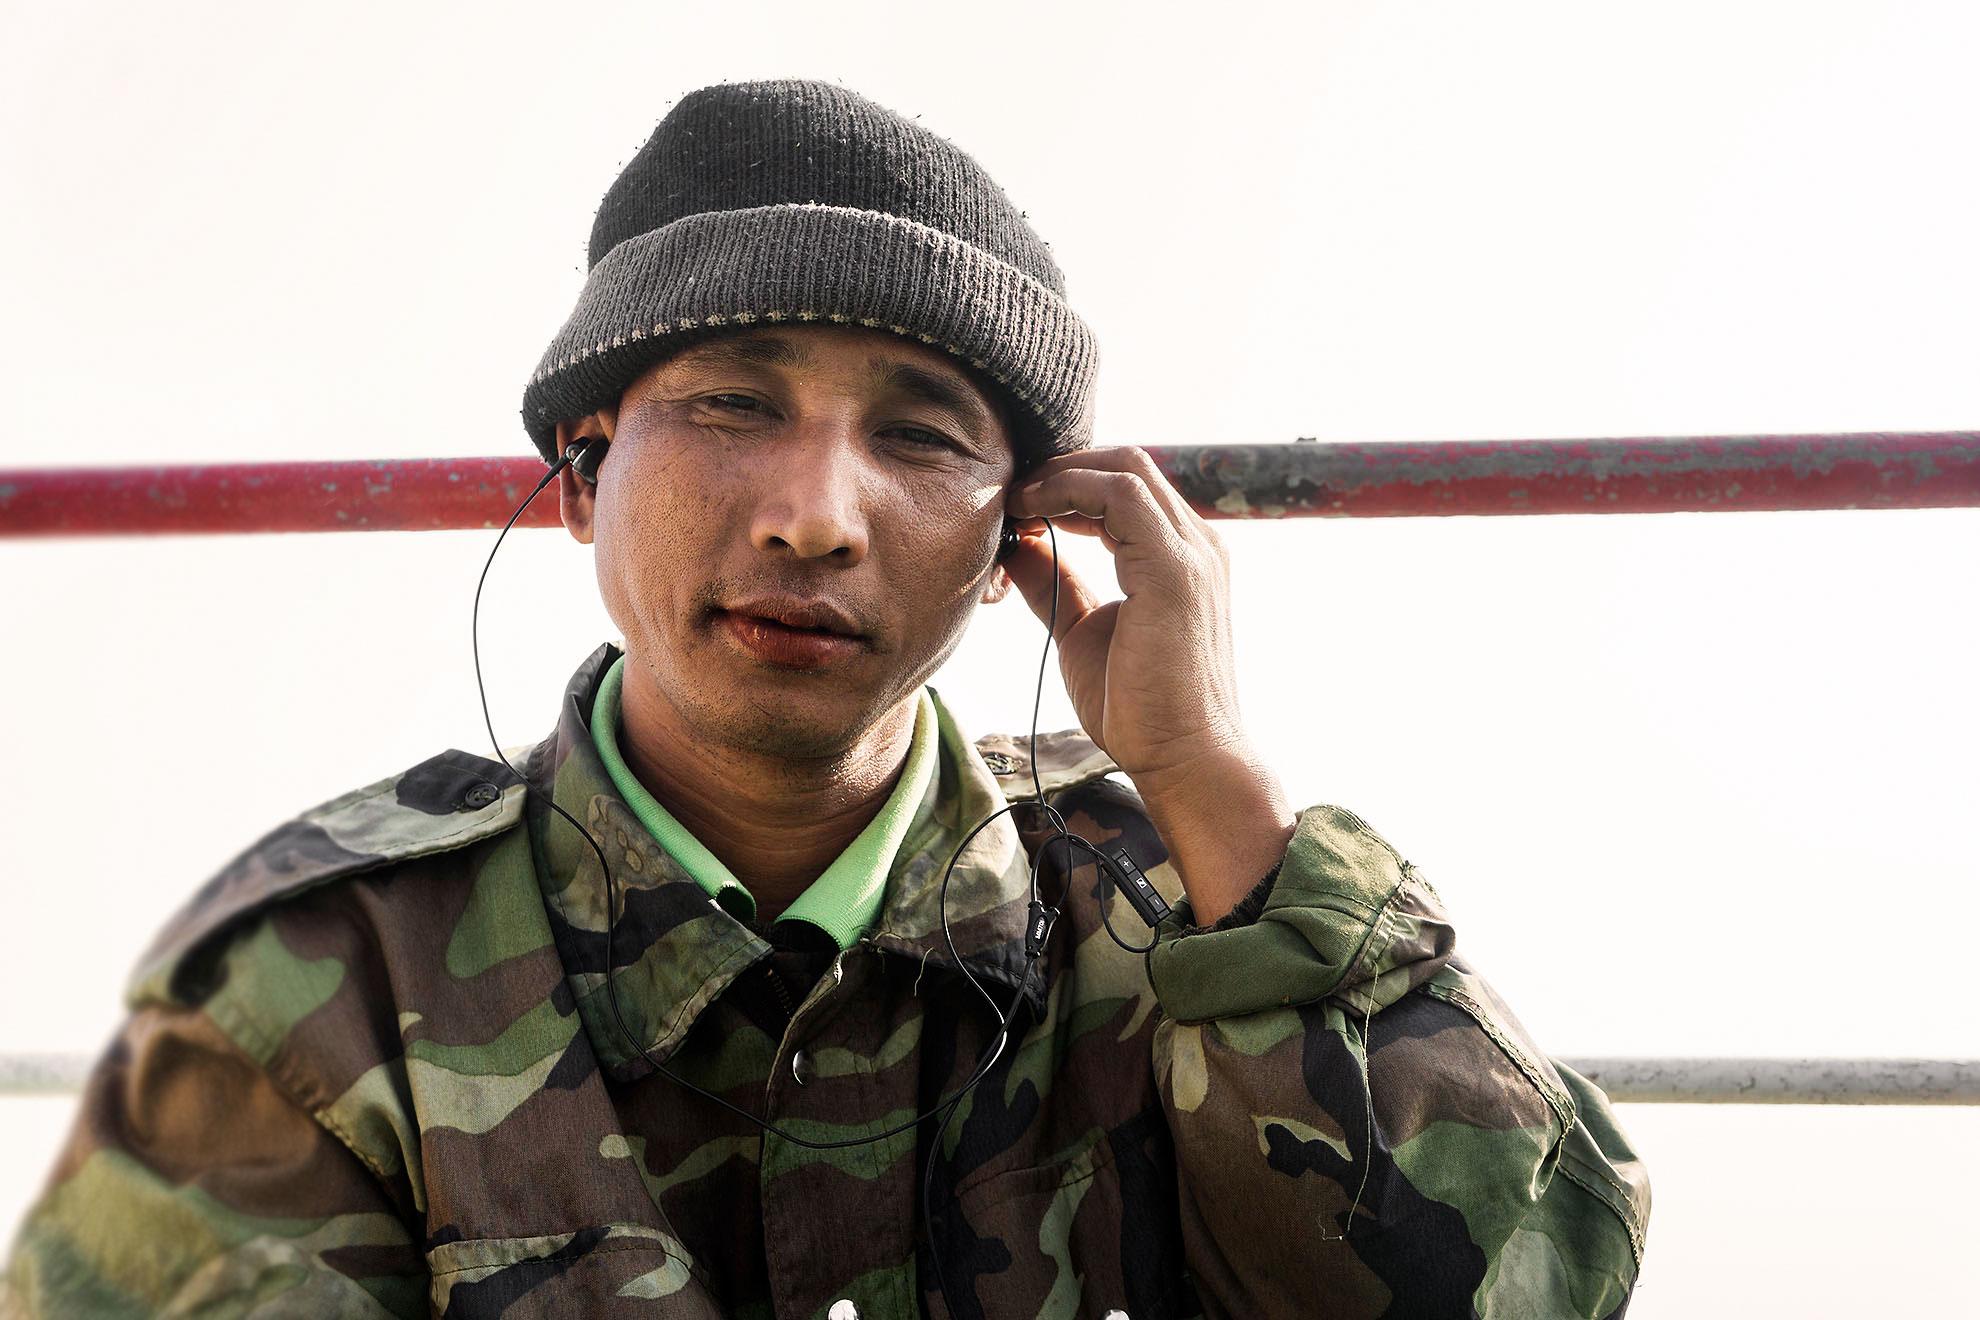 Foto Soldat